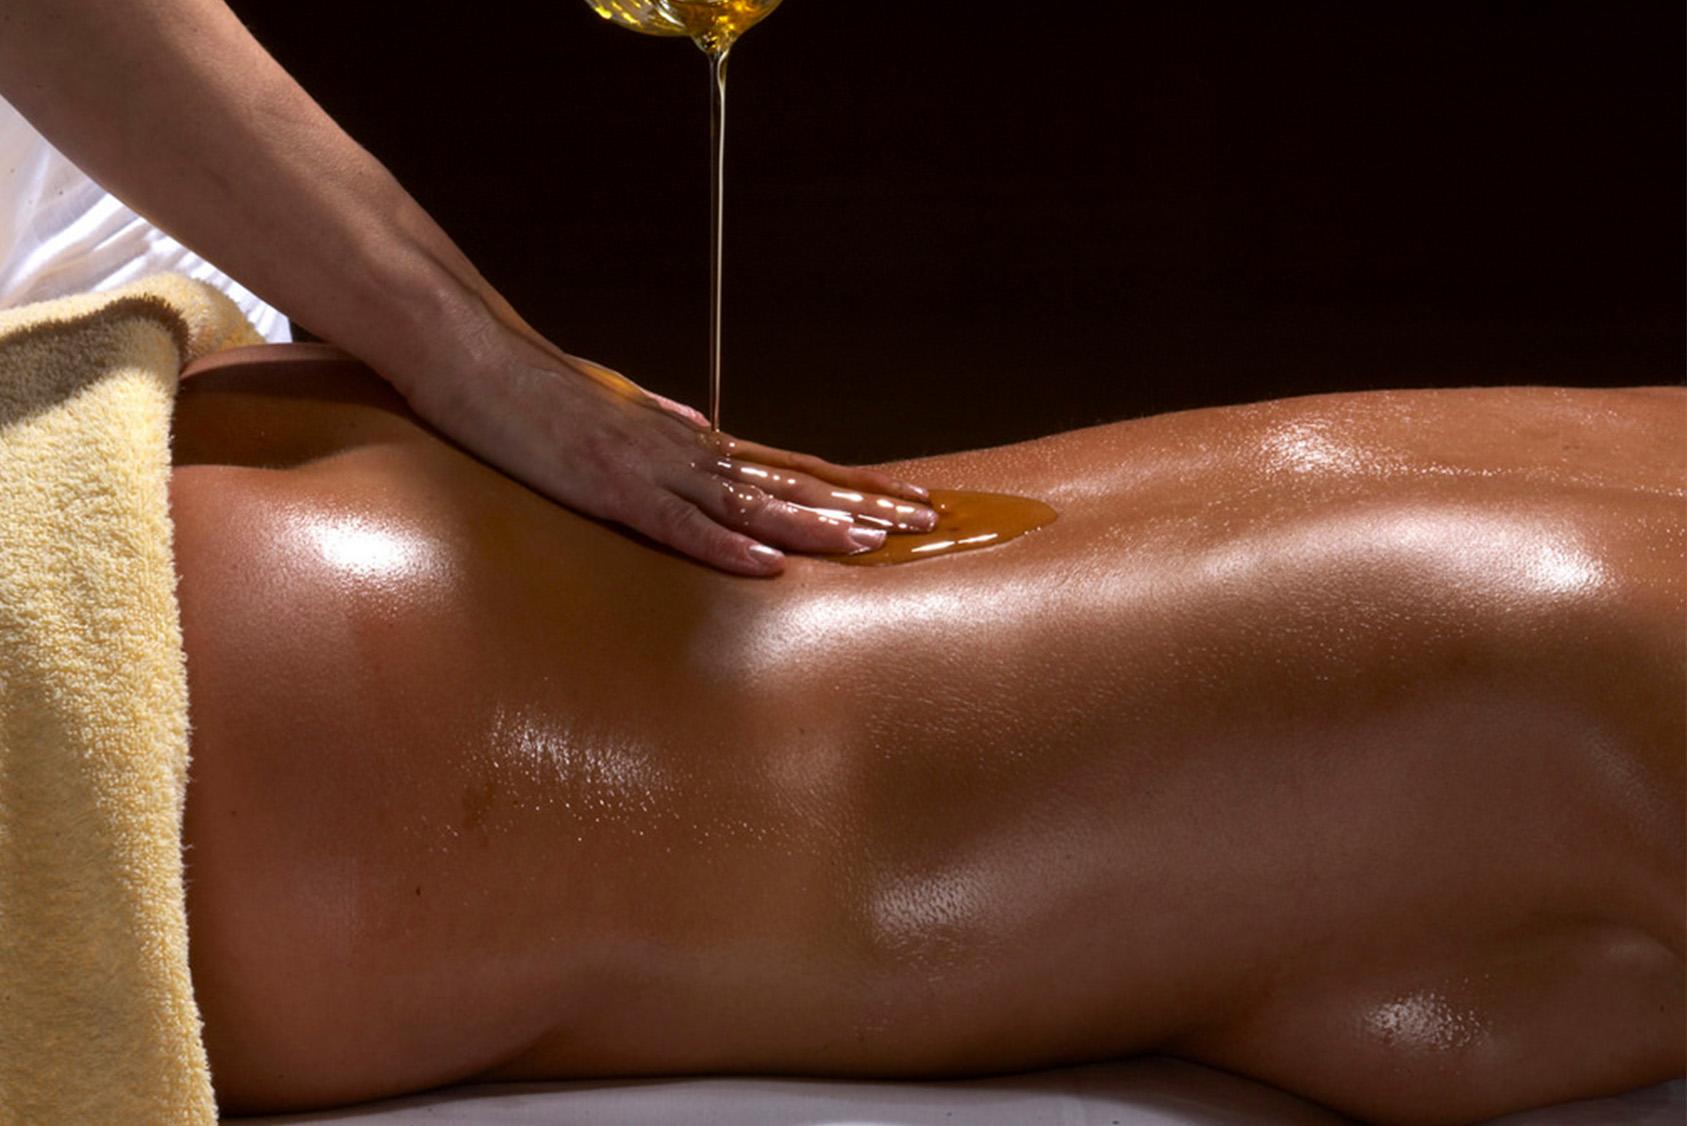 Oiled Massage